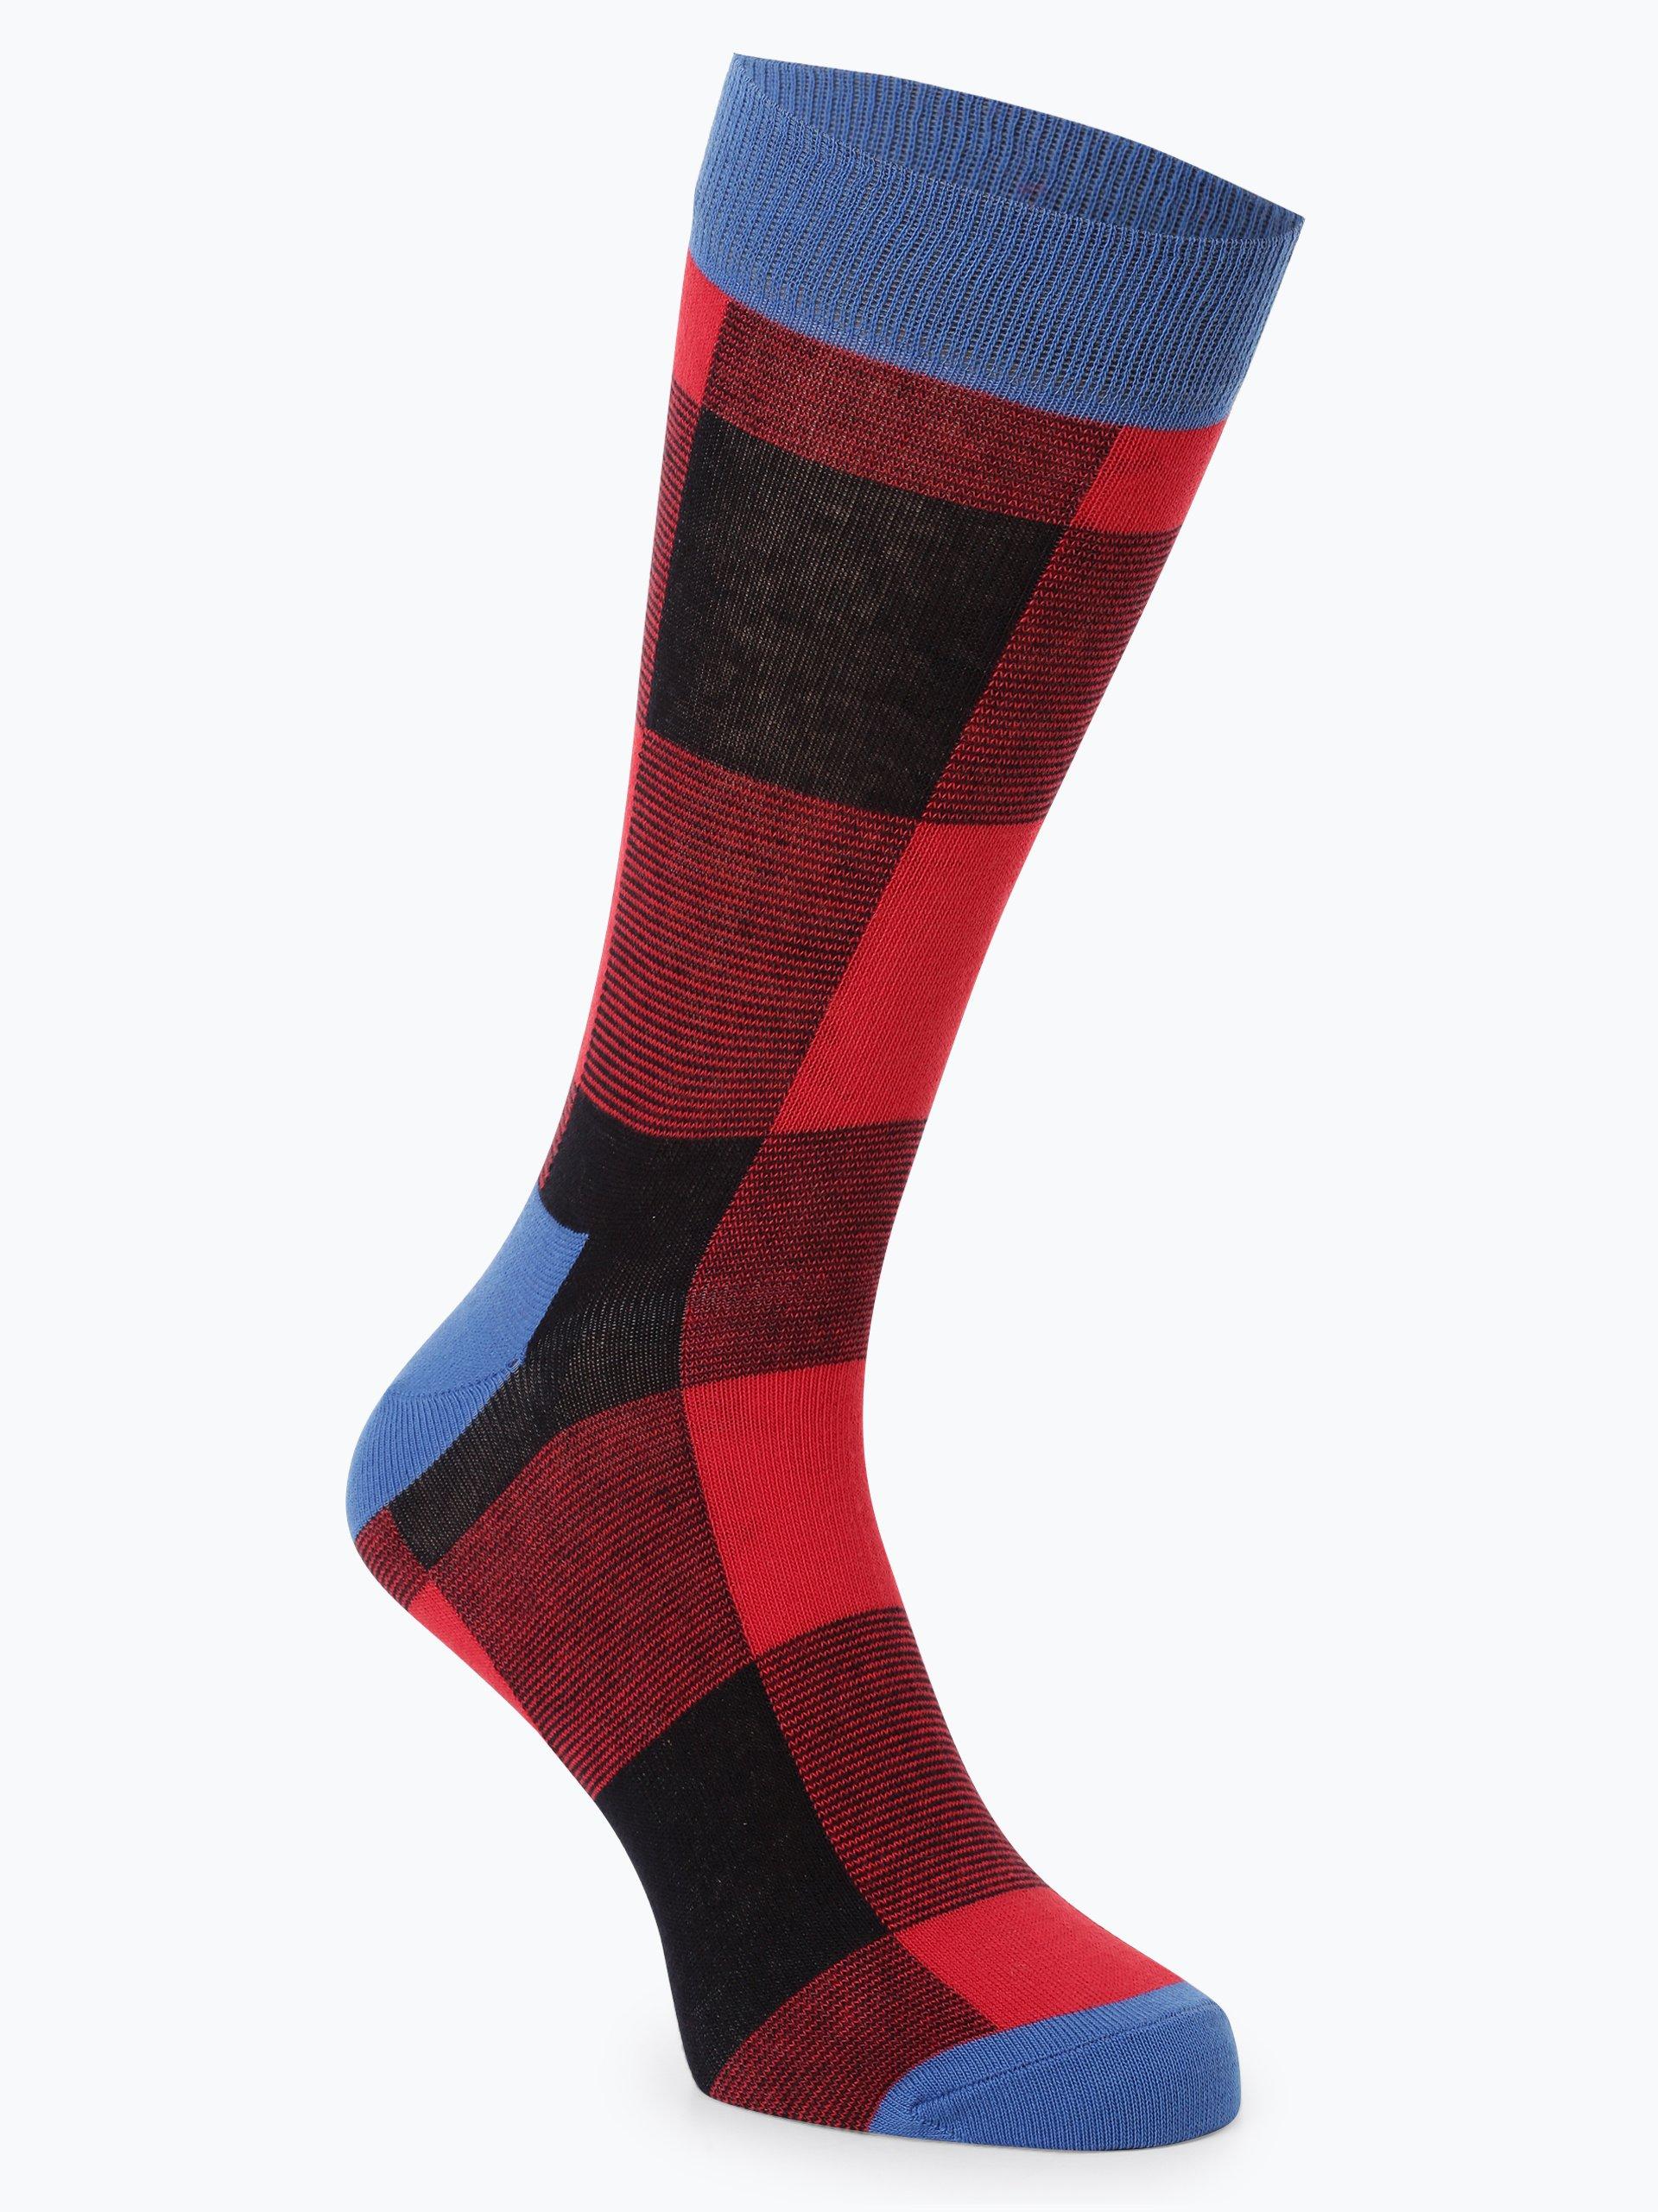 Happy Socks skarpety z drobnej dzianiny